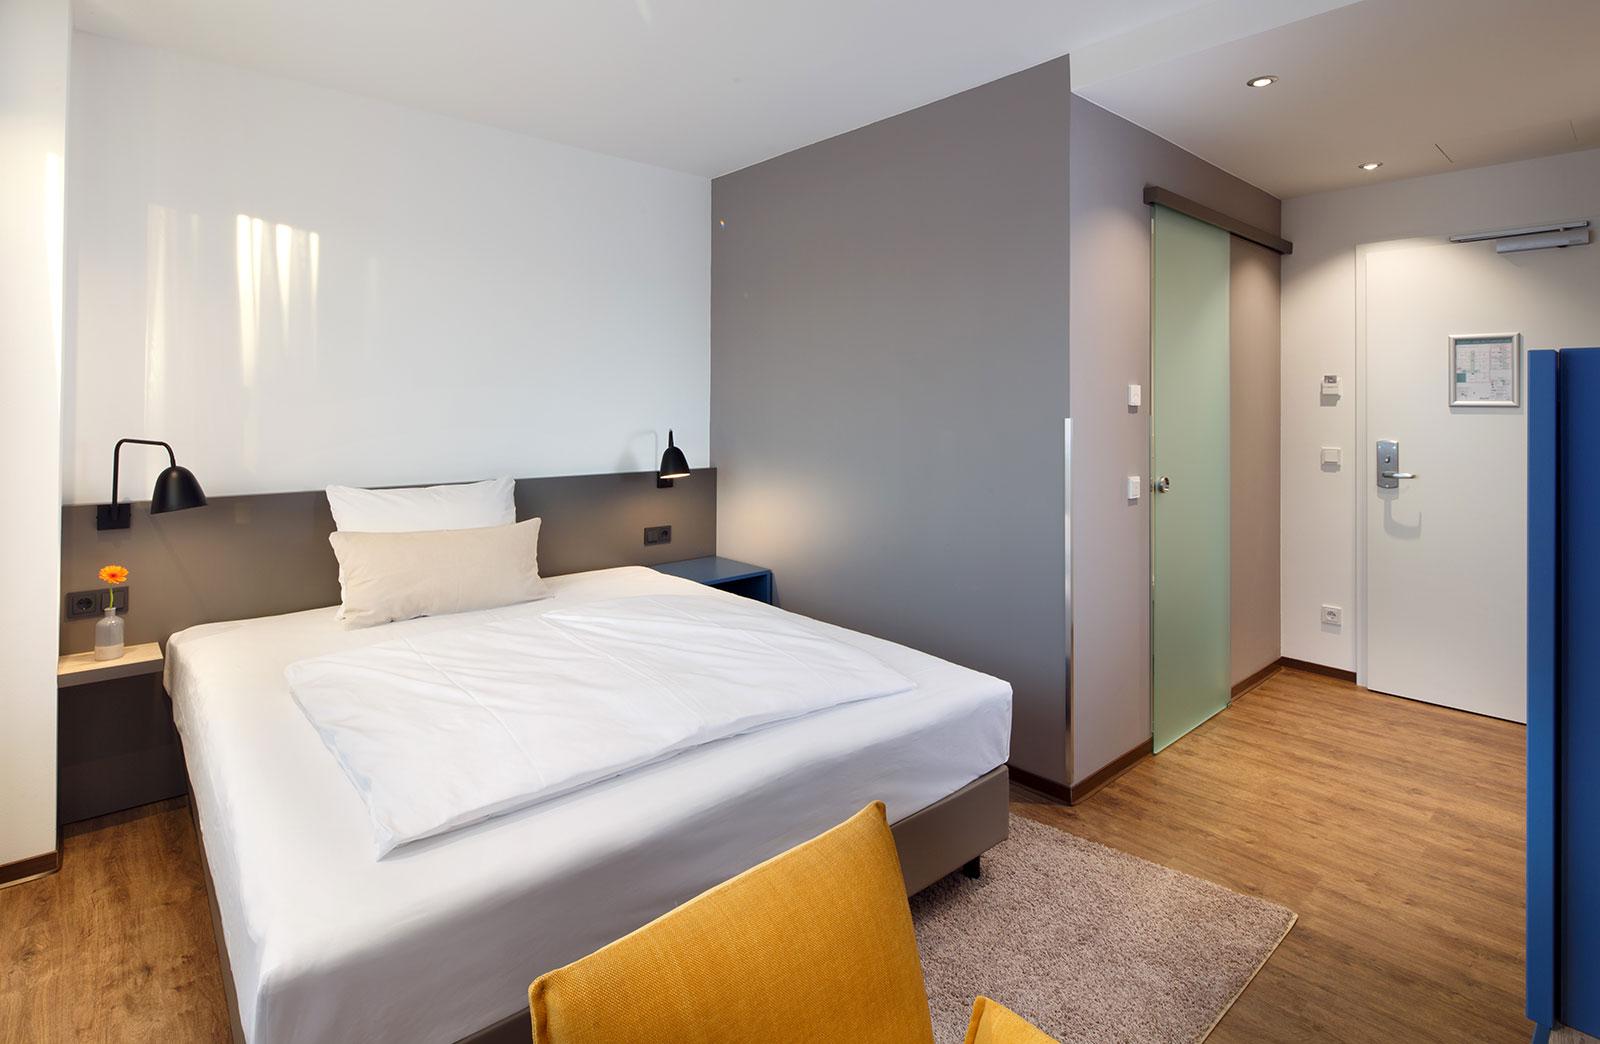 gem tliche superior einzelzimmer nahe regensburg homey hotel. Black Bedroom Furniture Sets. Home Design Ideas